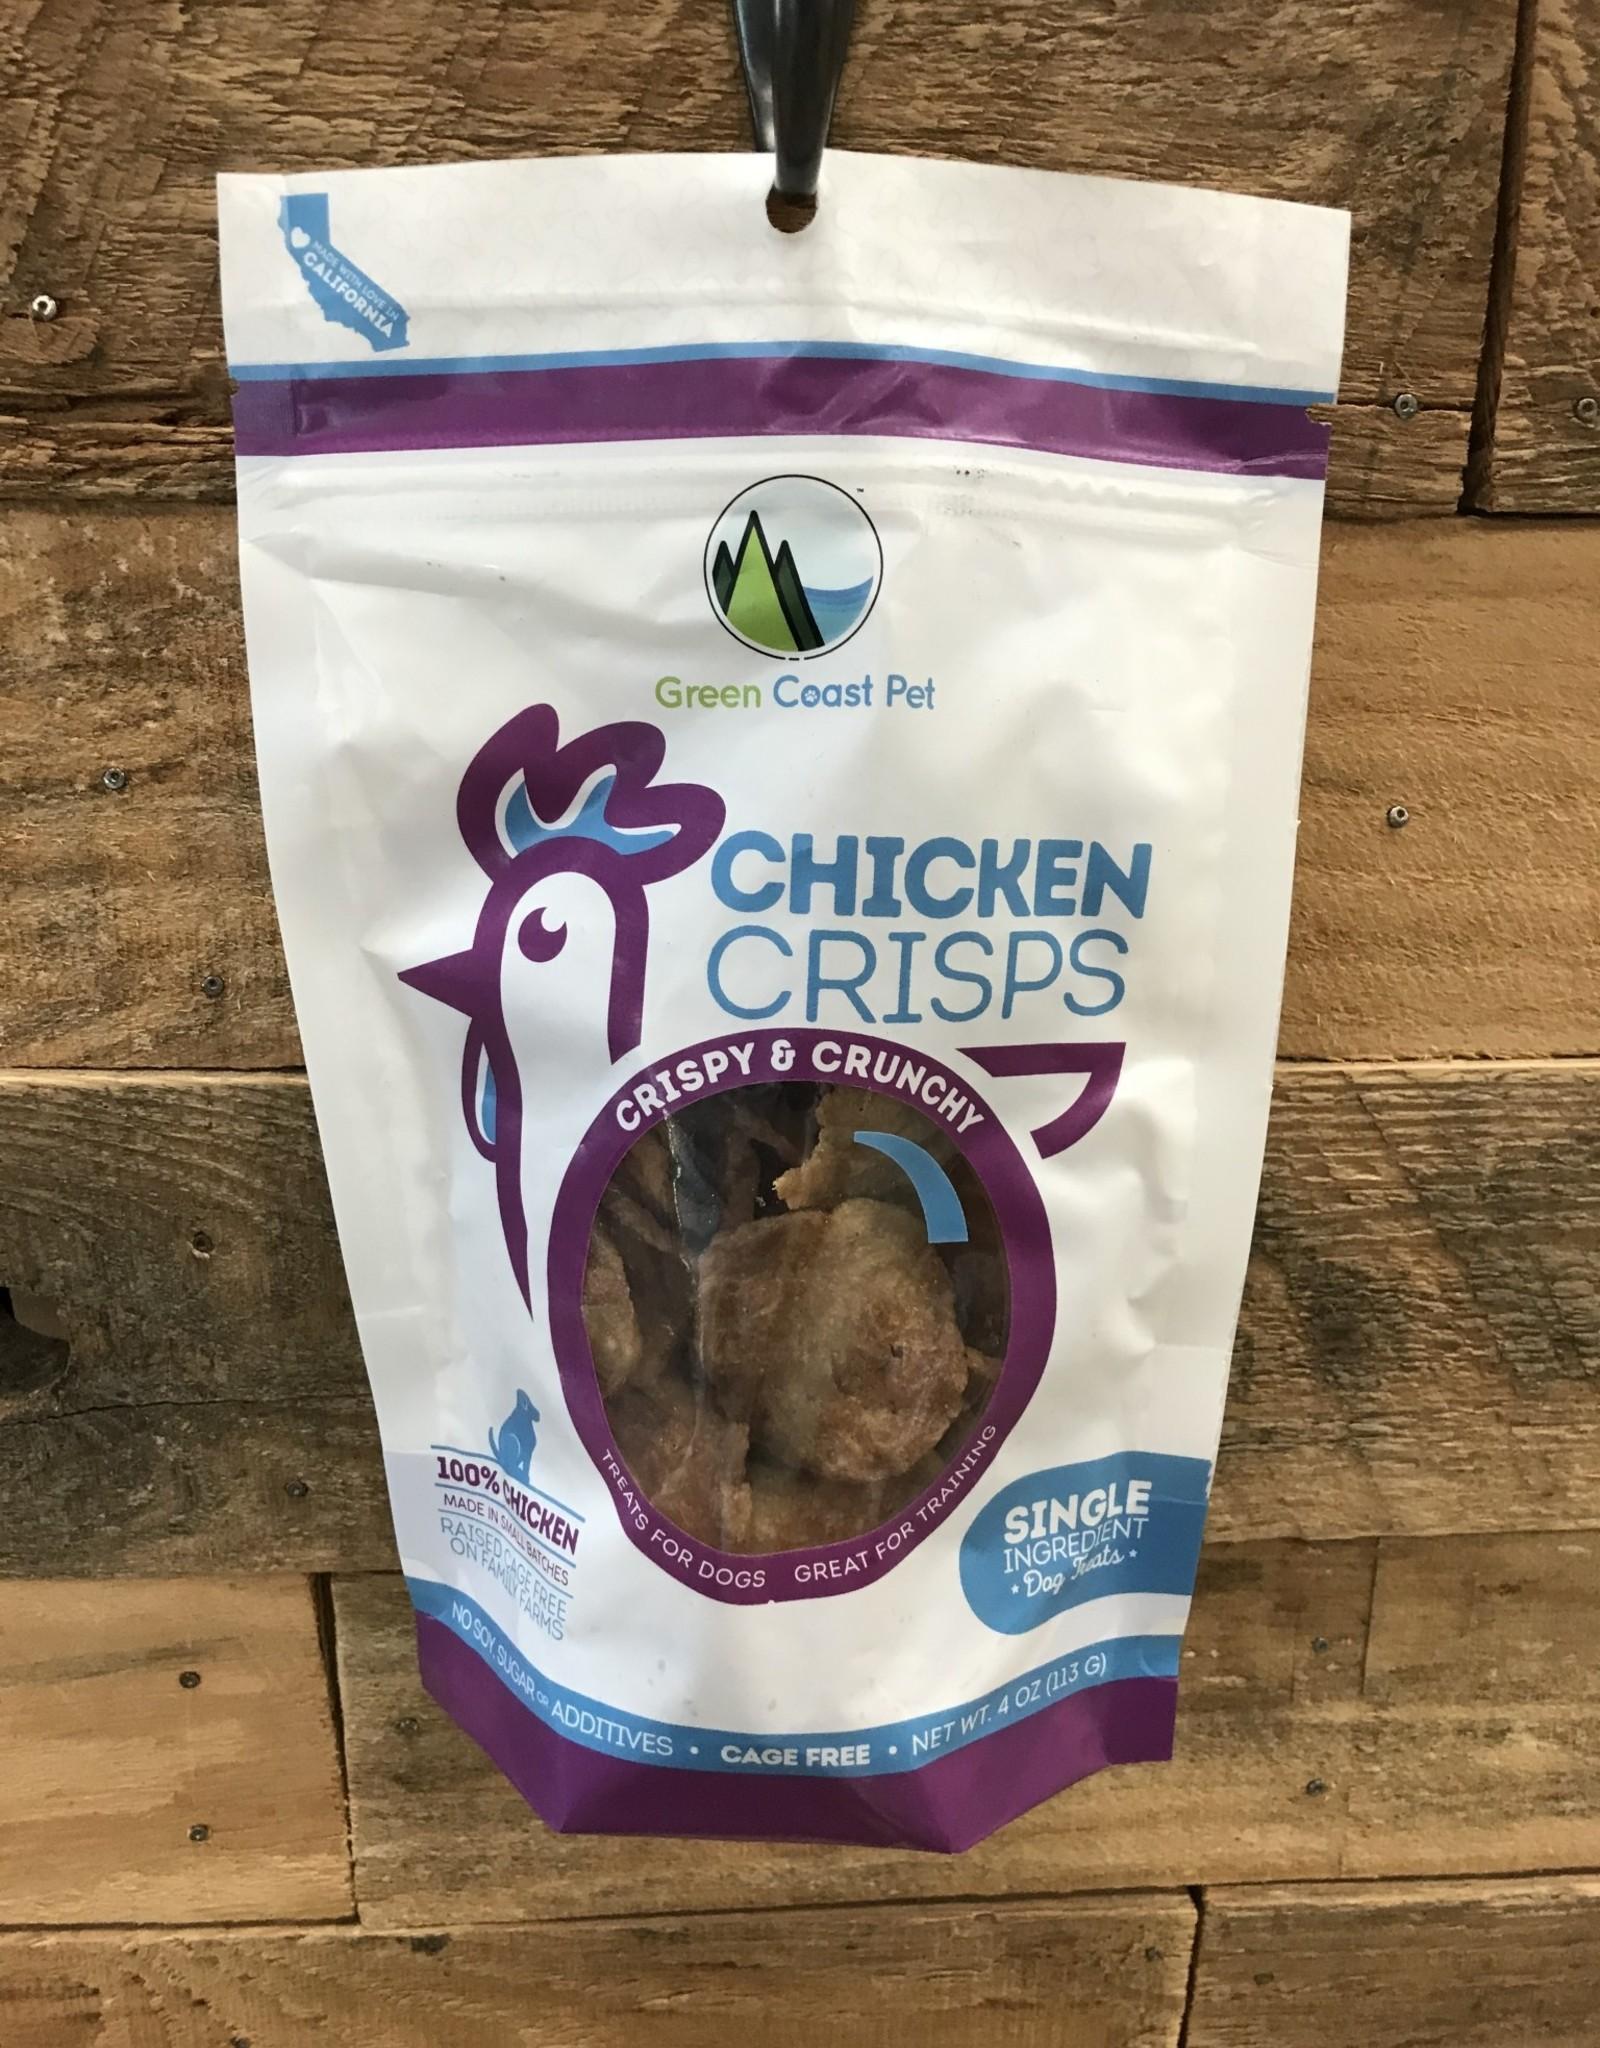 Green Coast Chicken Crisps 4oz